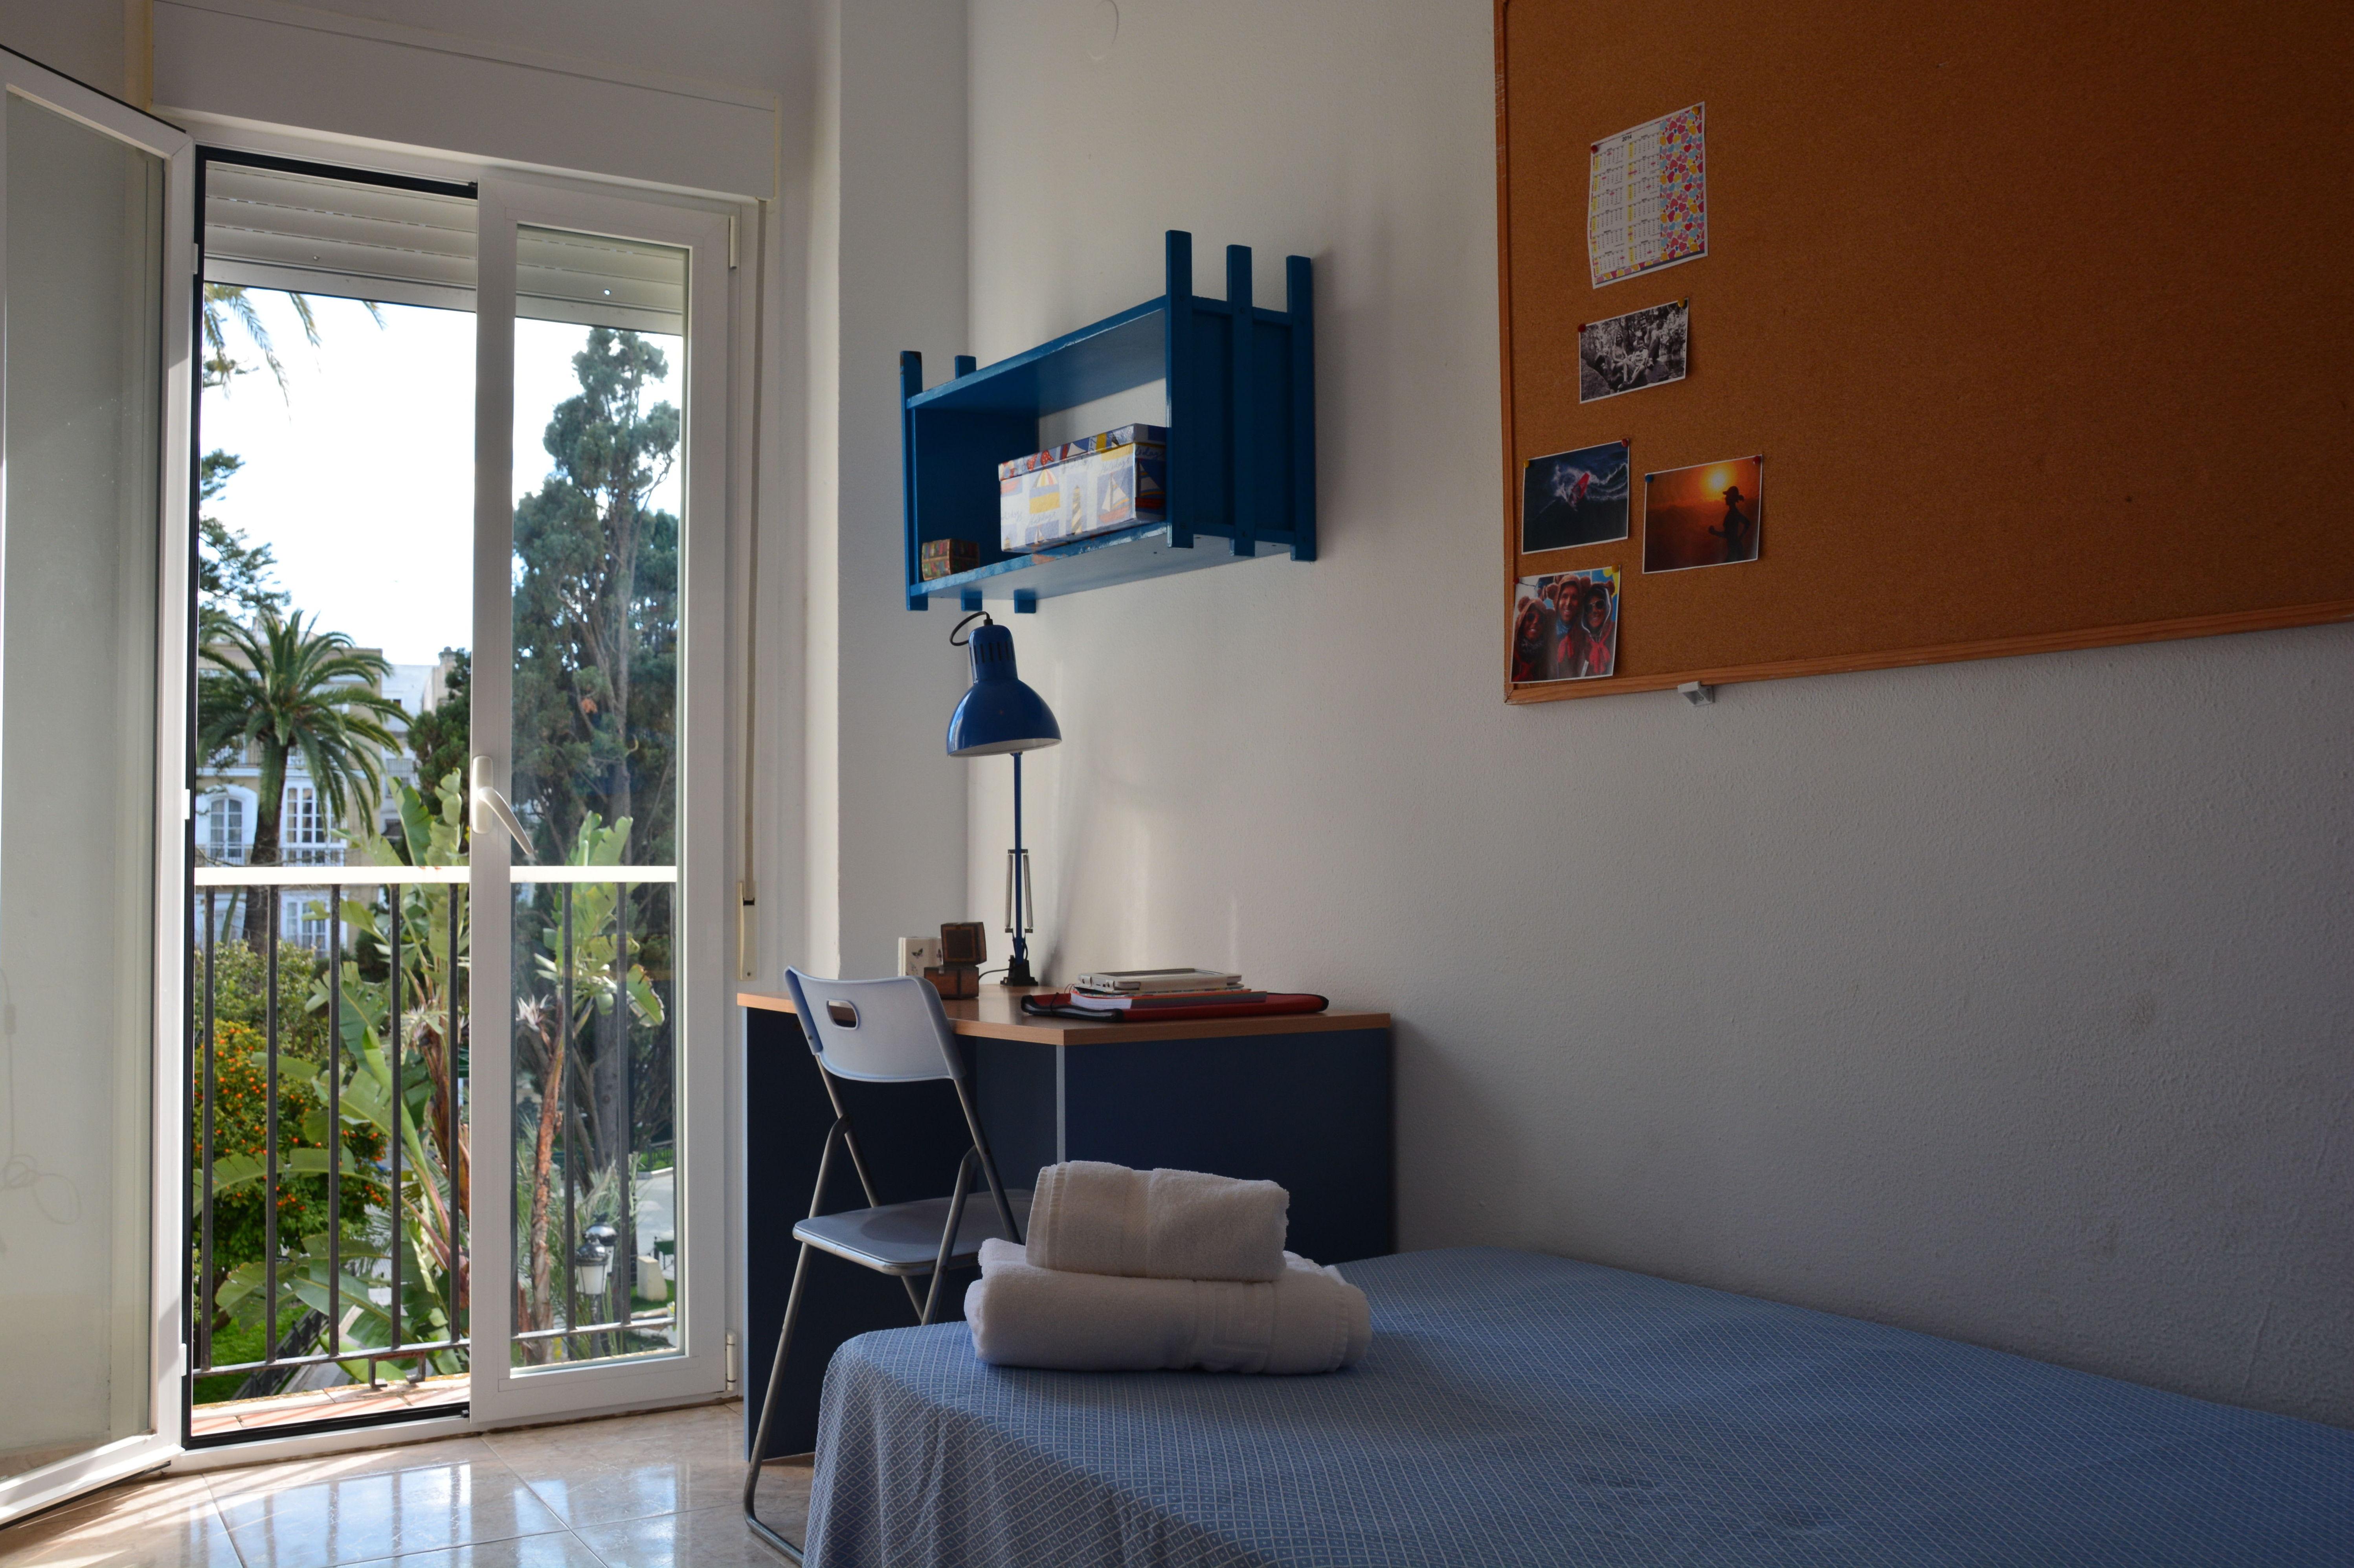 RESERVA TU PLAZA: RESERVA TU PLAZA  de Residencia de Estudiantes Cádiz Centro